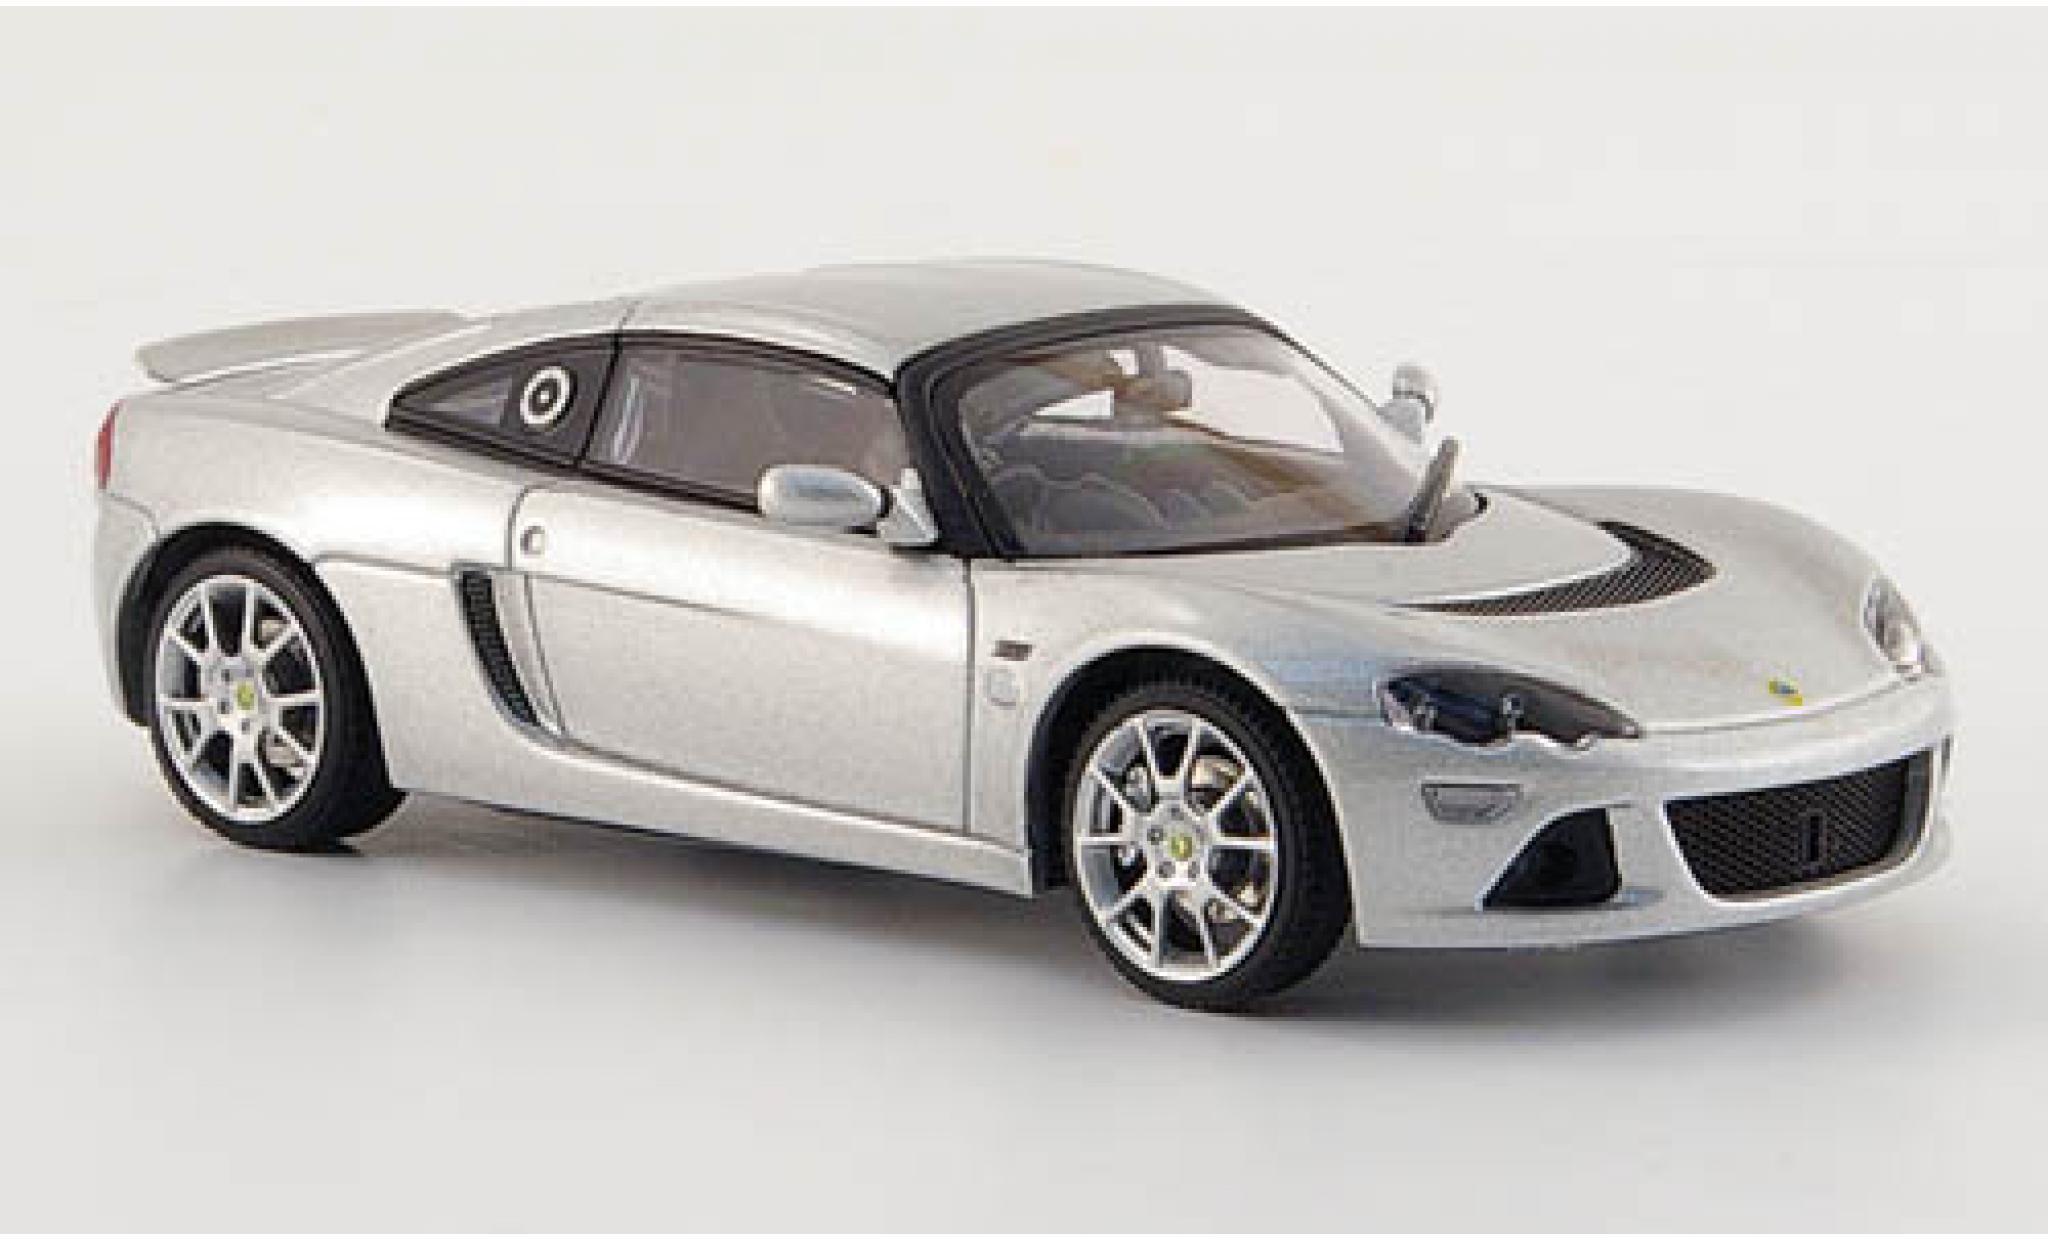 Lotus Europa 1/43 AUTOart S grise